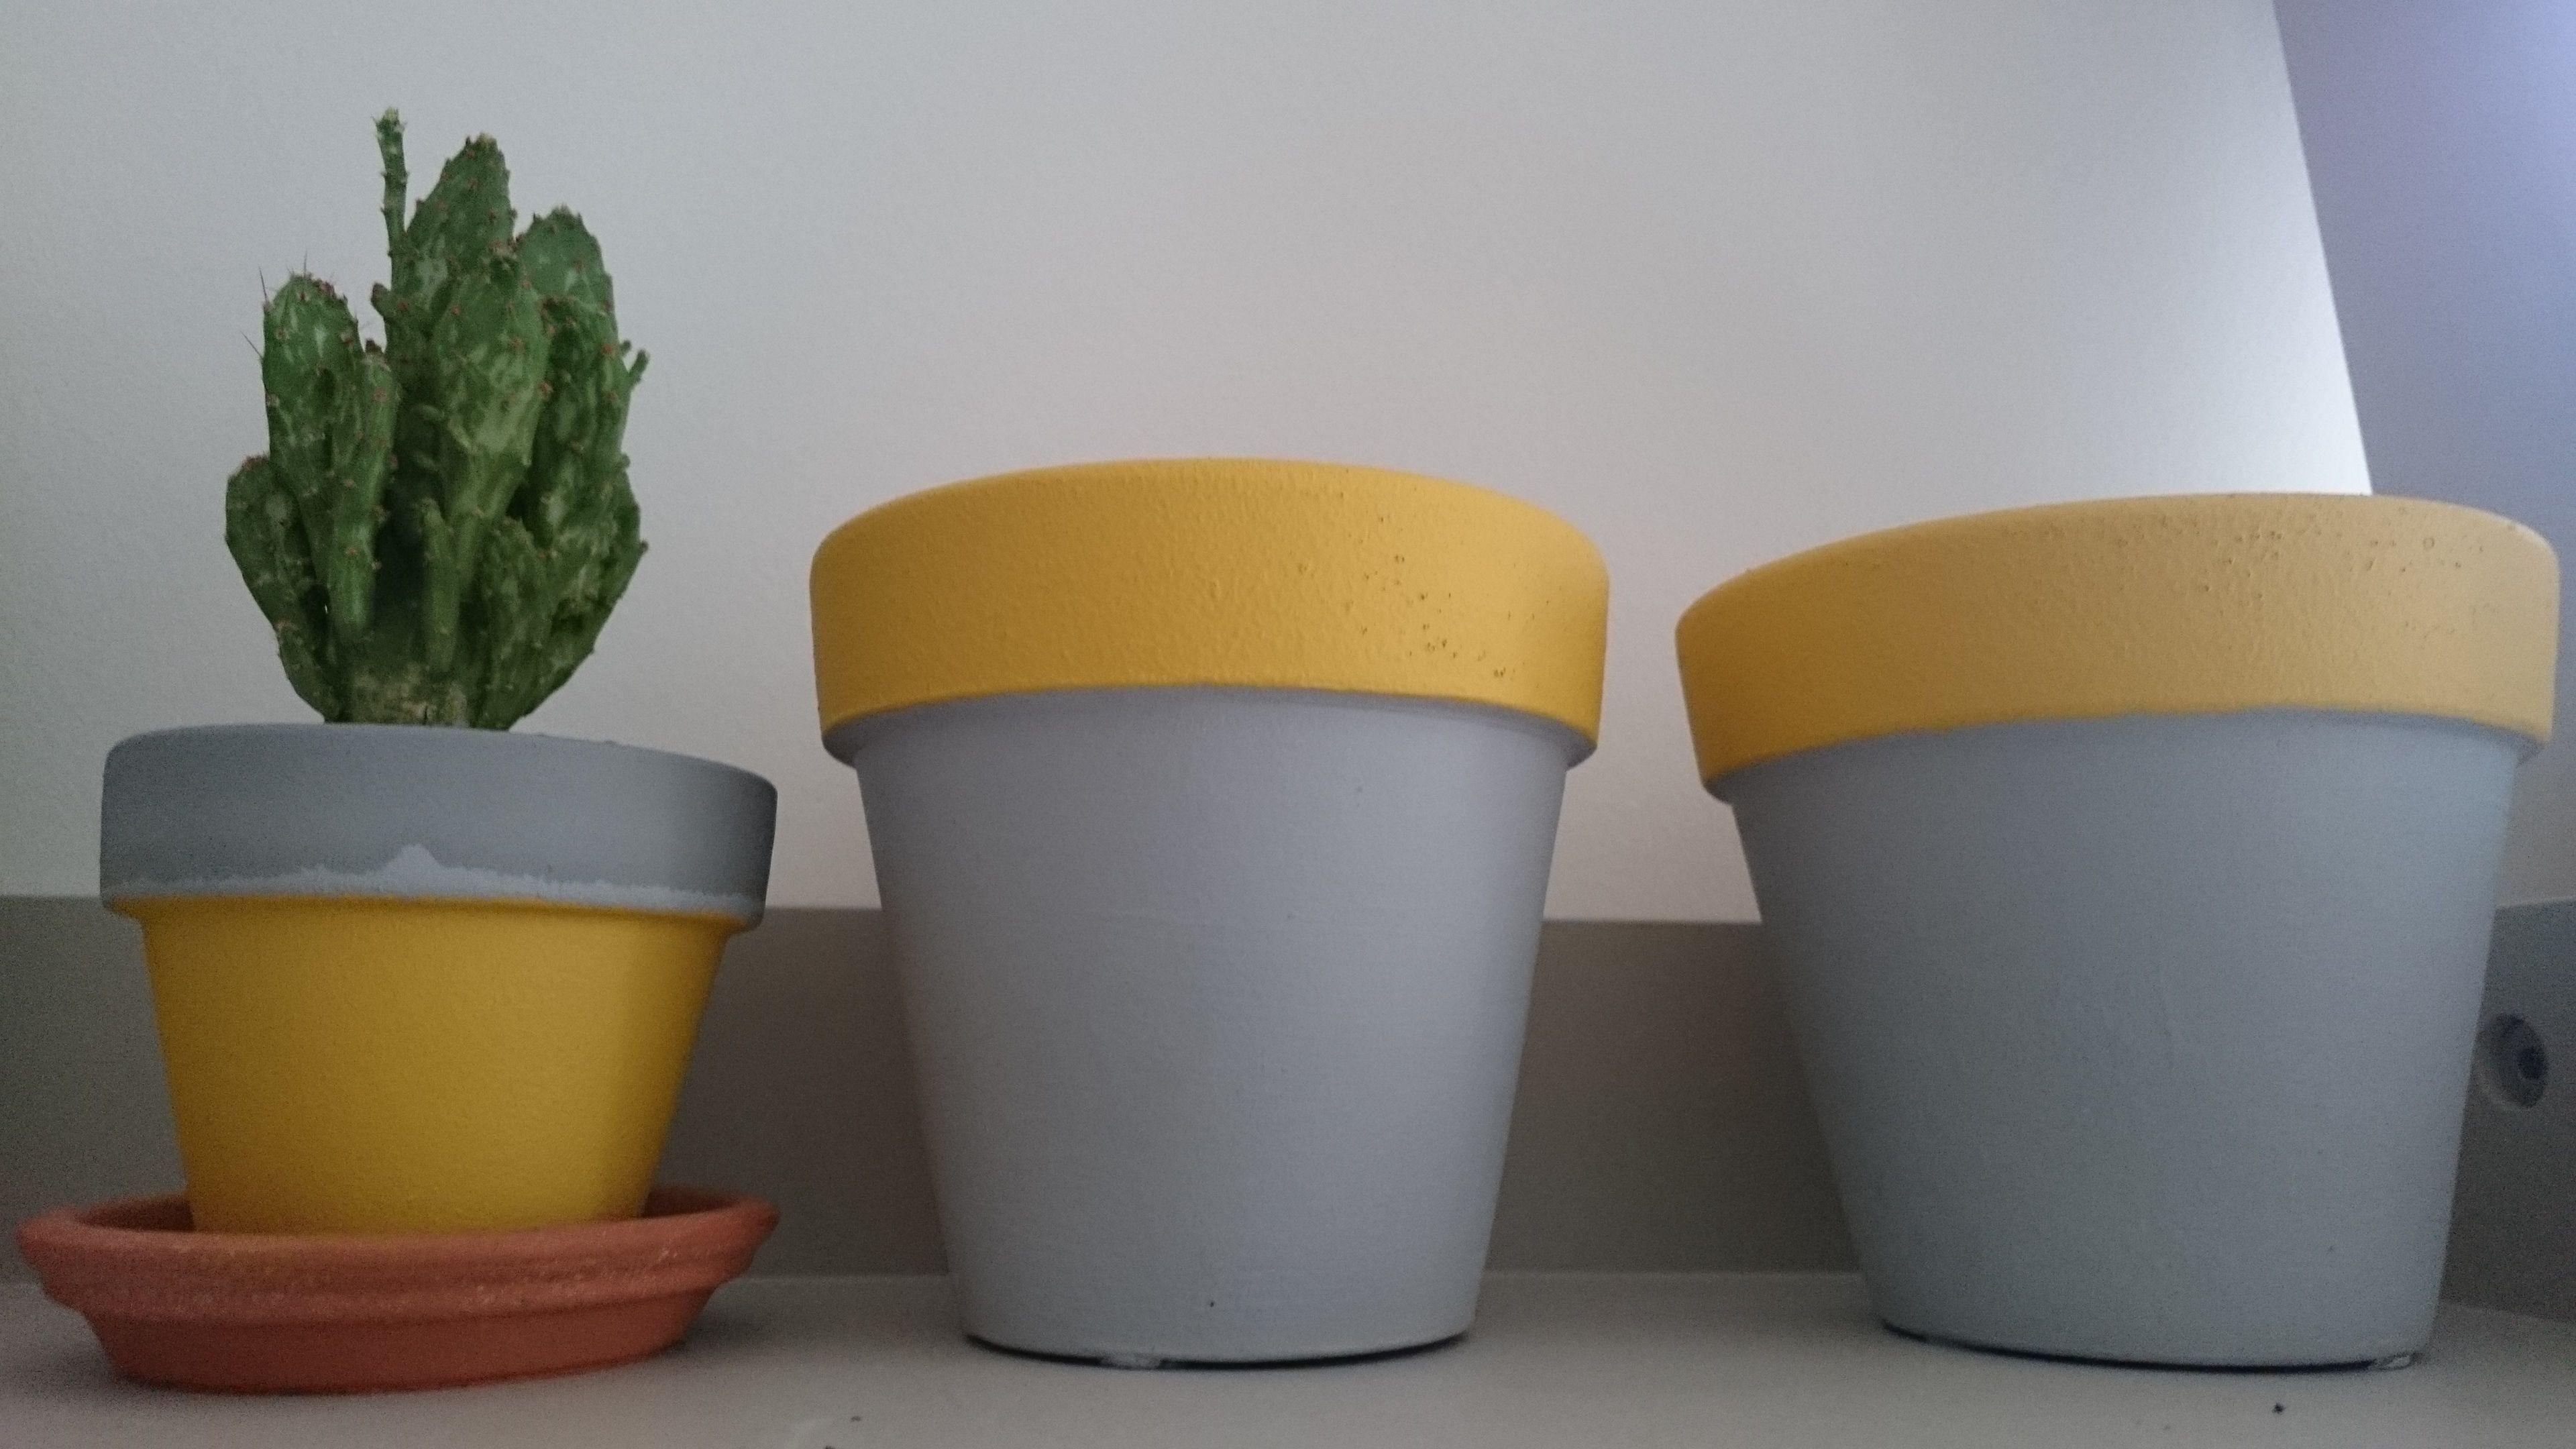 Small Painted Terracotta Plant Pots Mustard And Grey Colours Cactus Terracotta Plant Pots Painted Plant Pots Bedroom Plants